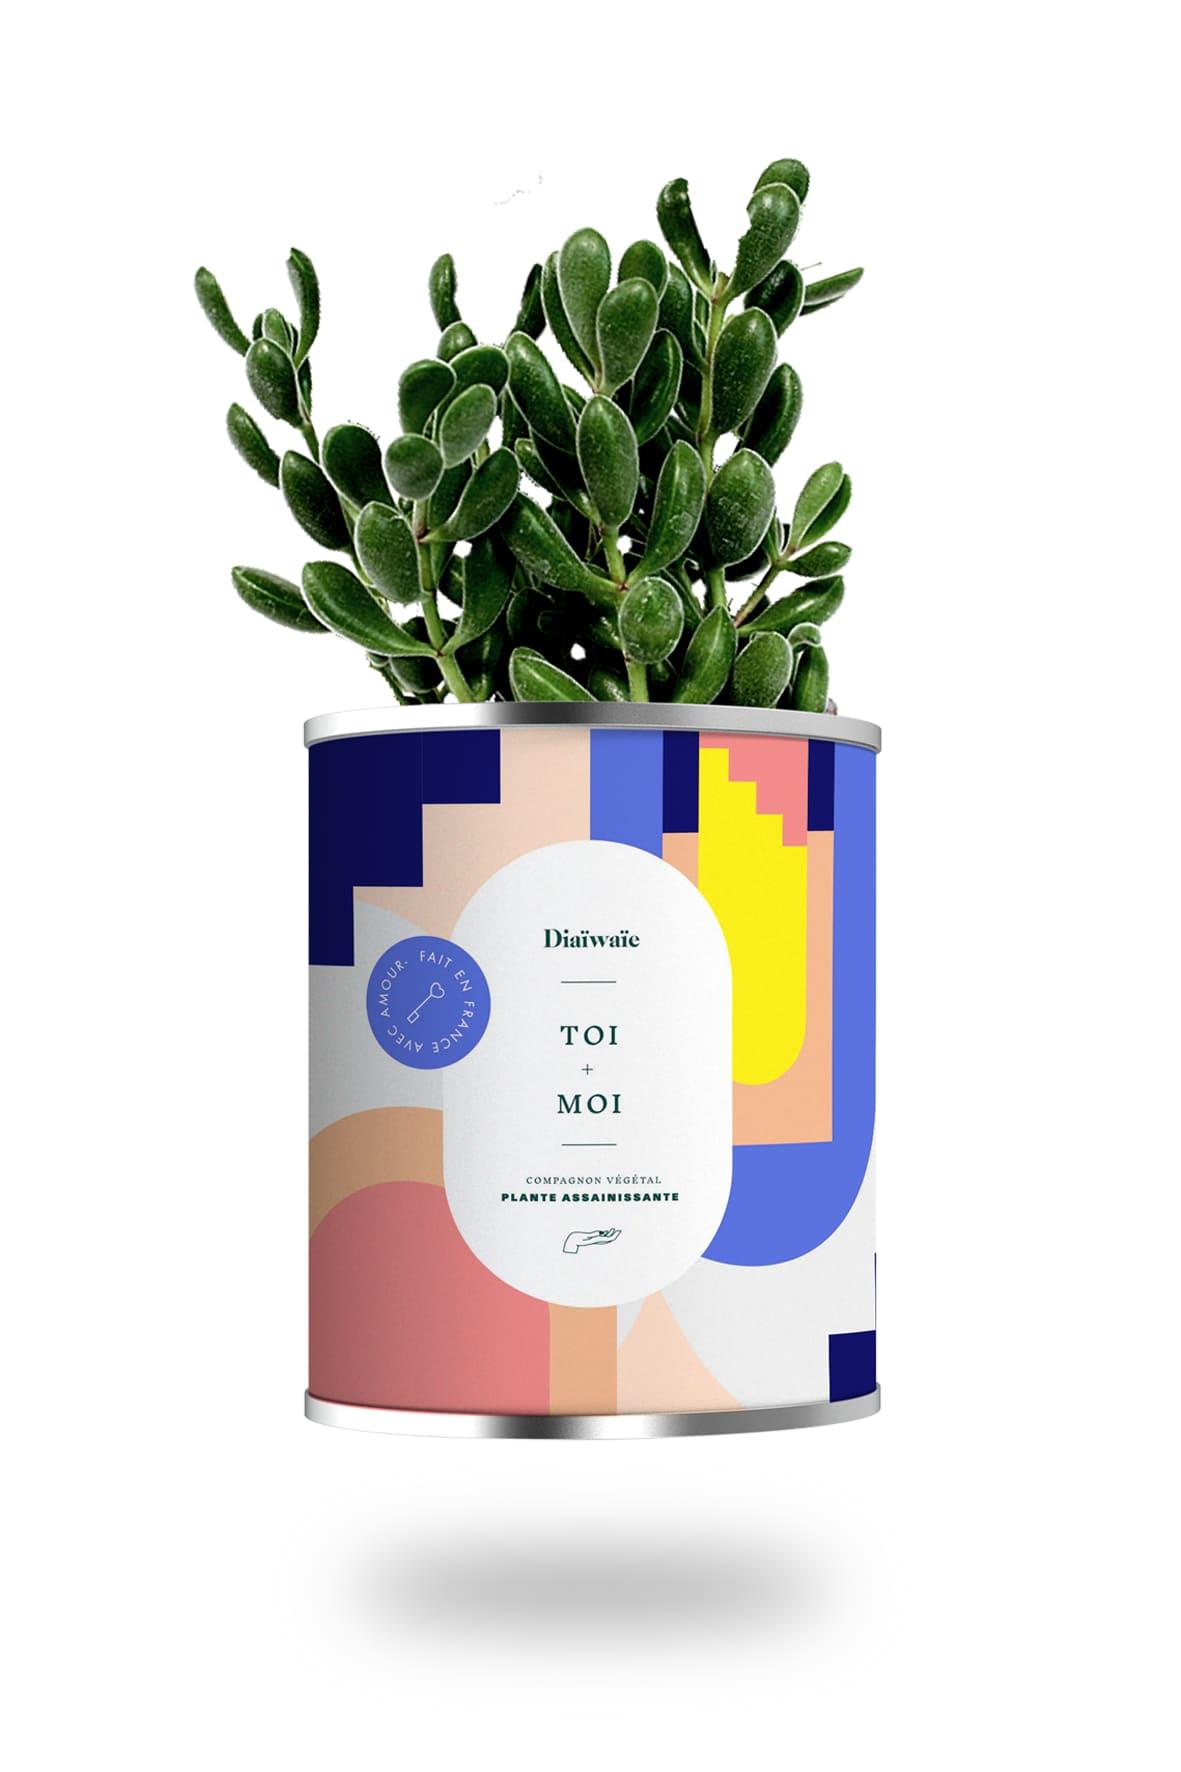 Diawae Cactus ou plante pot grand modle toi + moi